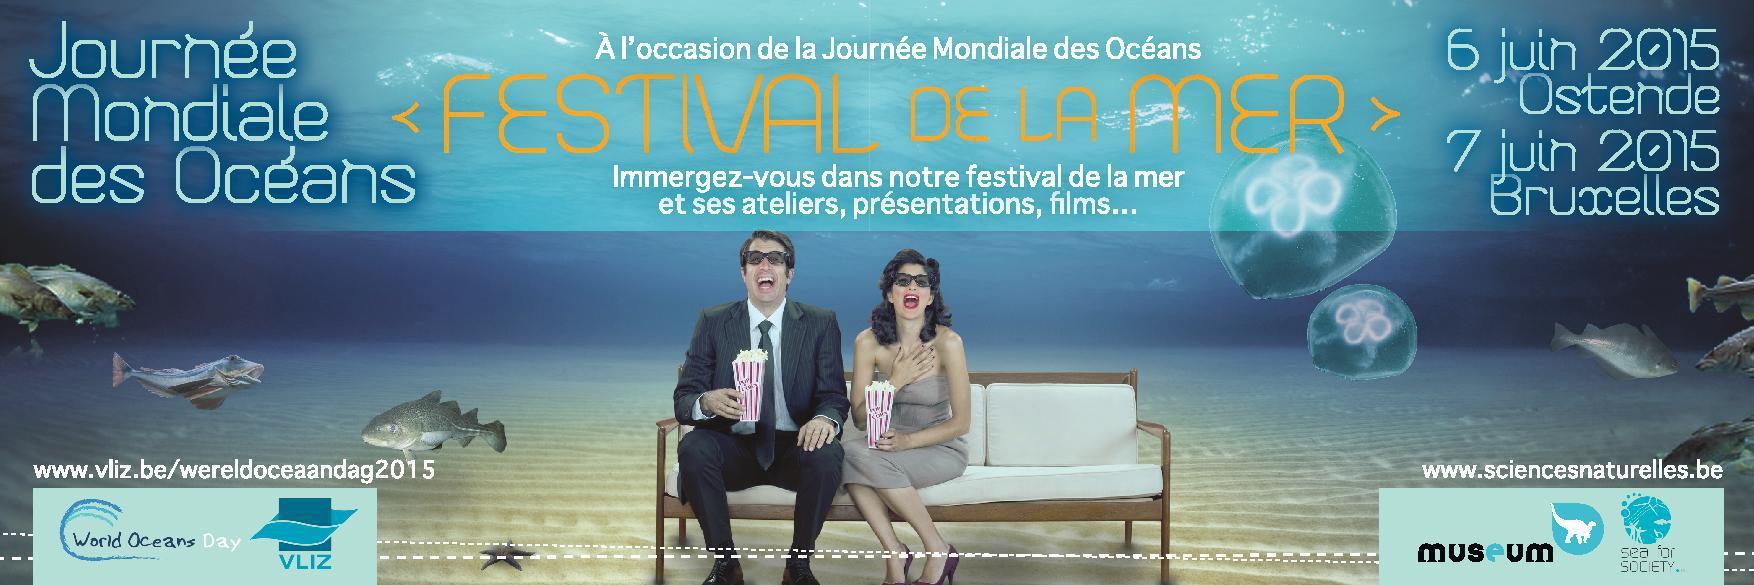 Invitation WOD 2015